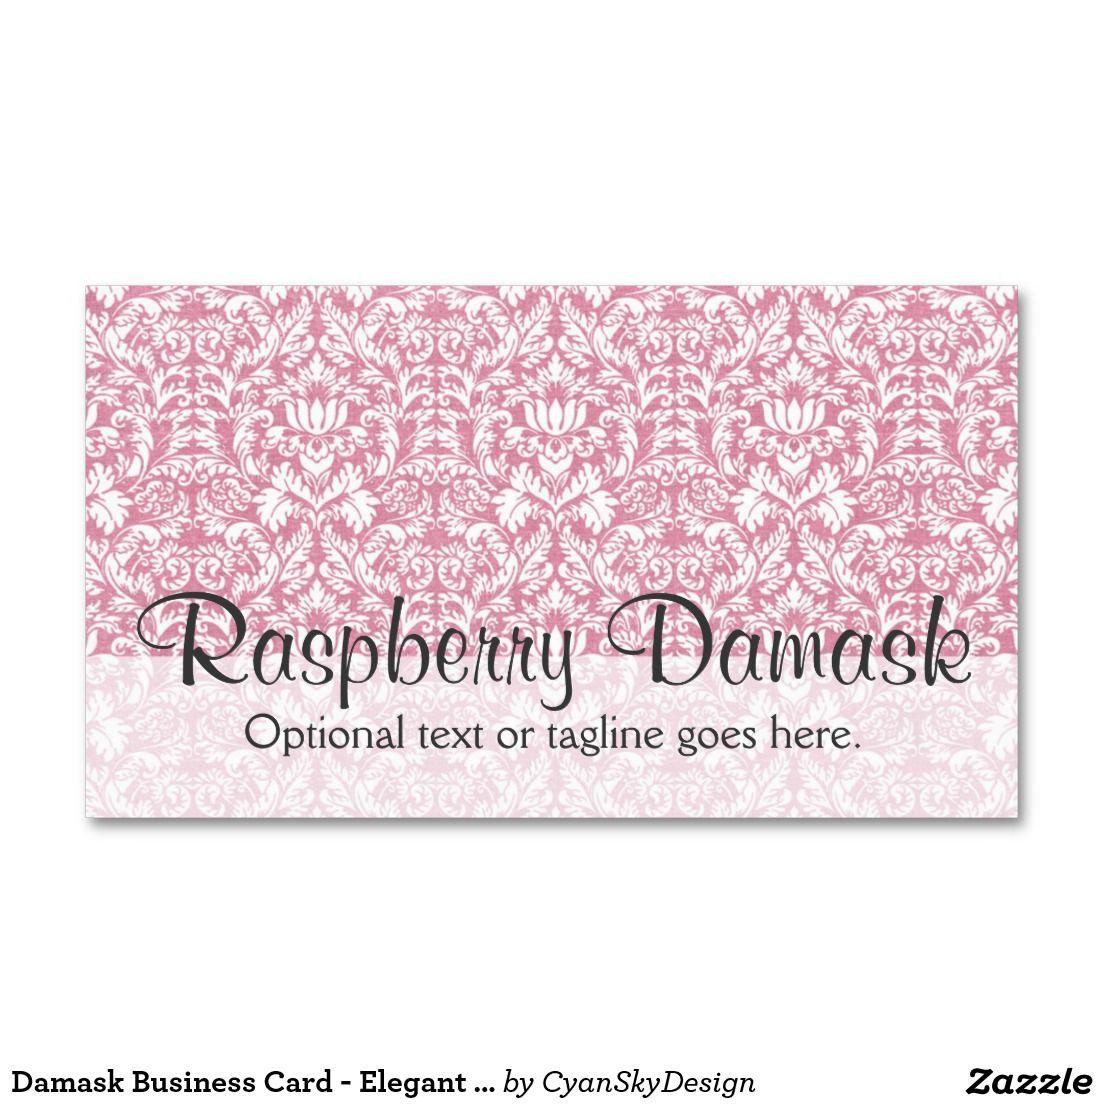 Damask Business Card - Elegant Dark Pink - #businesscard #smallbusiness #handmade #etsy #shop #branding #marketing #damask #pink